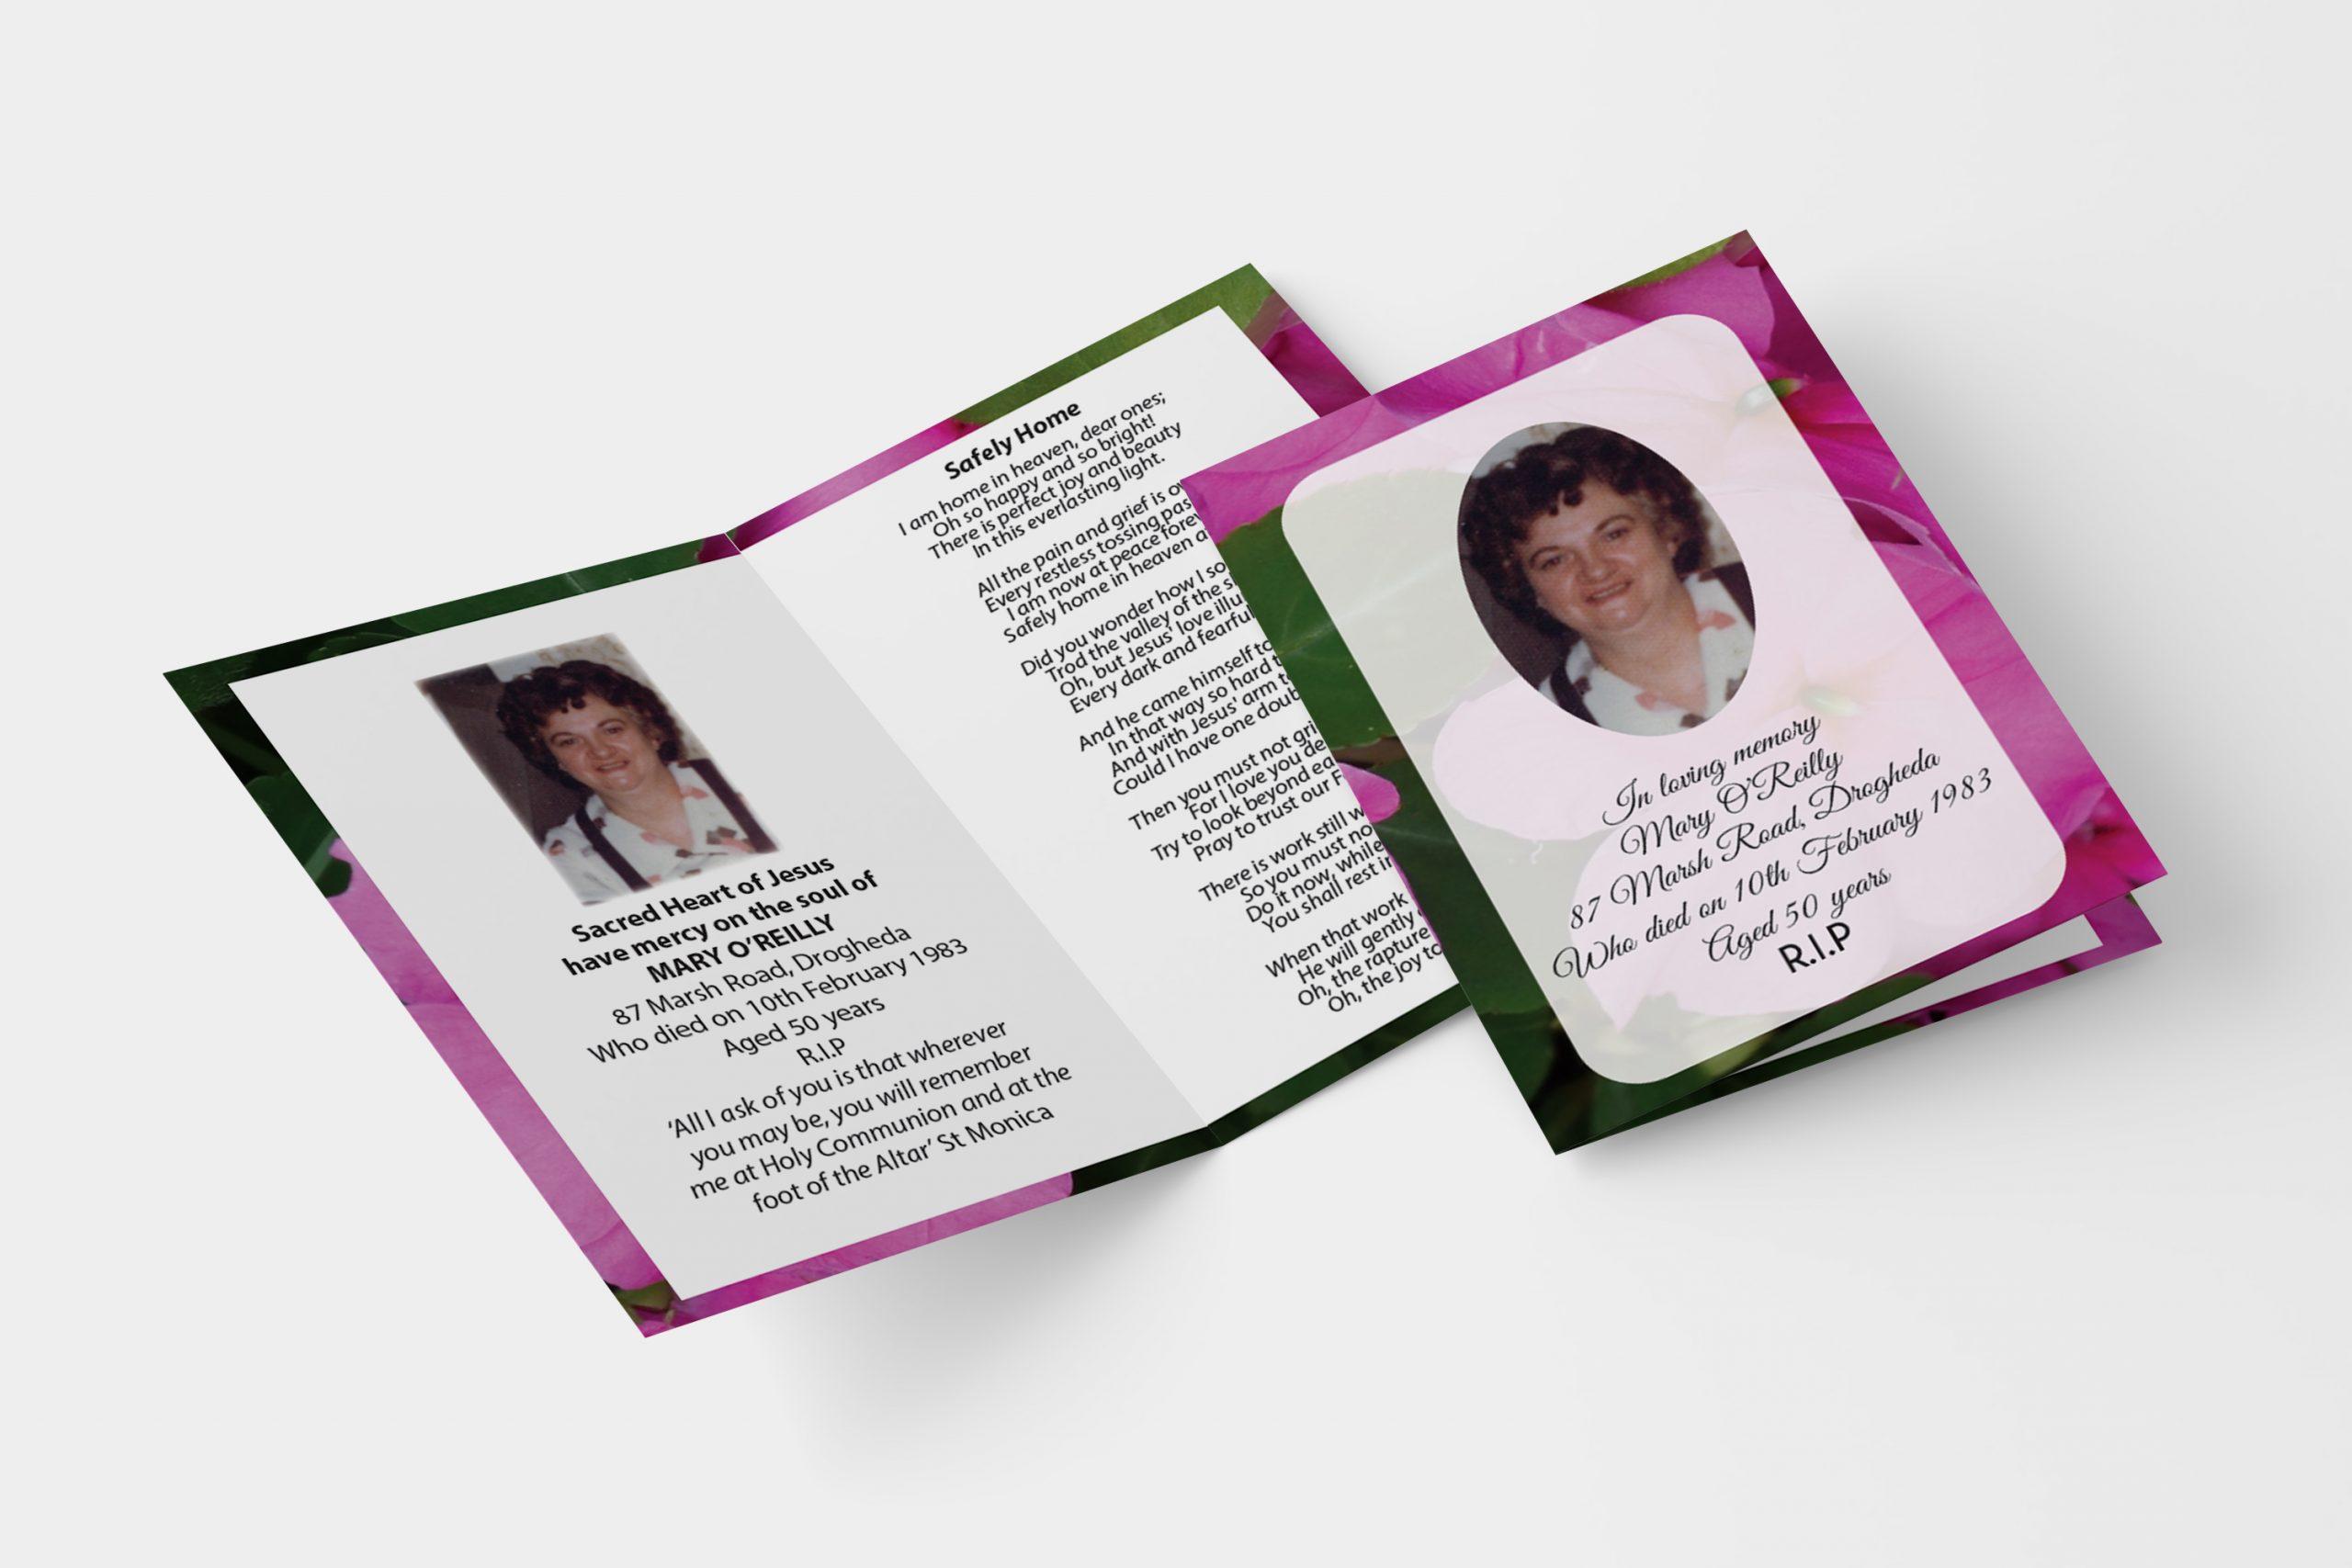 Pink flower folded memorial card